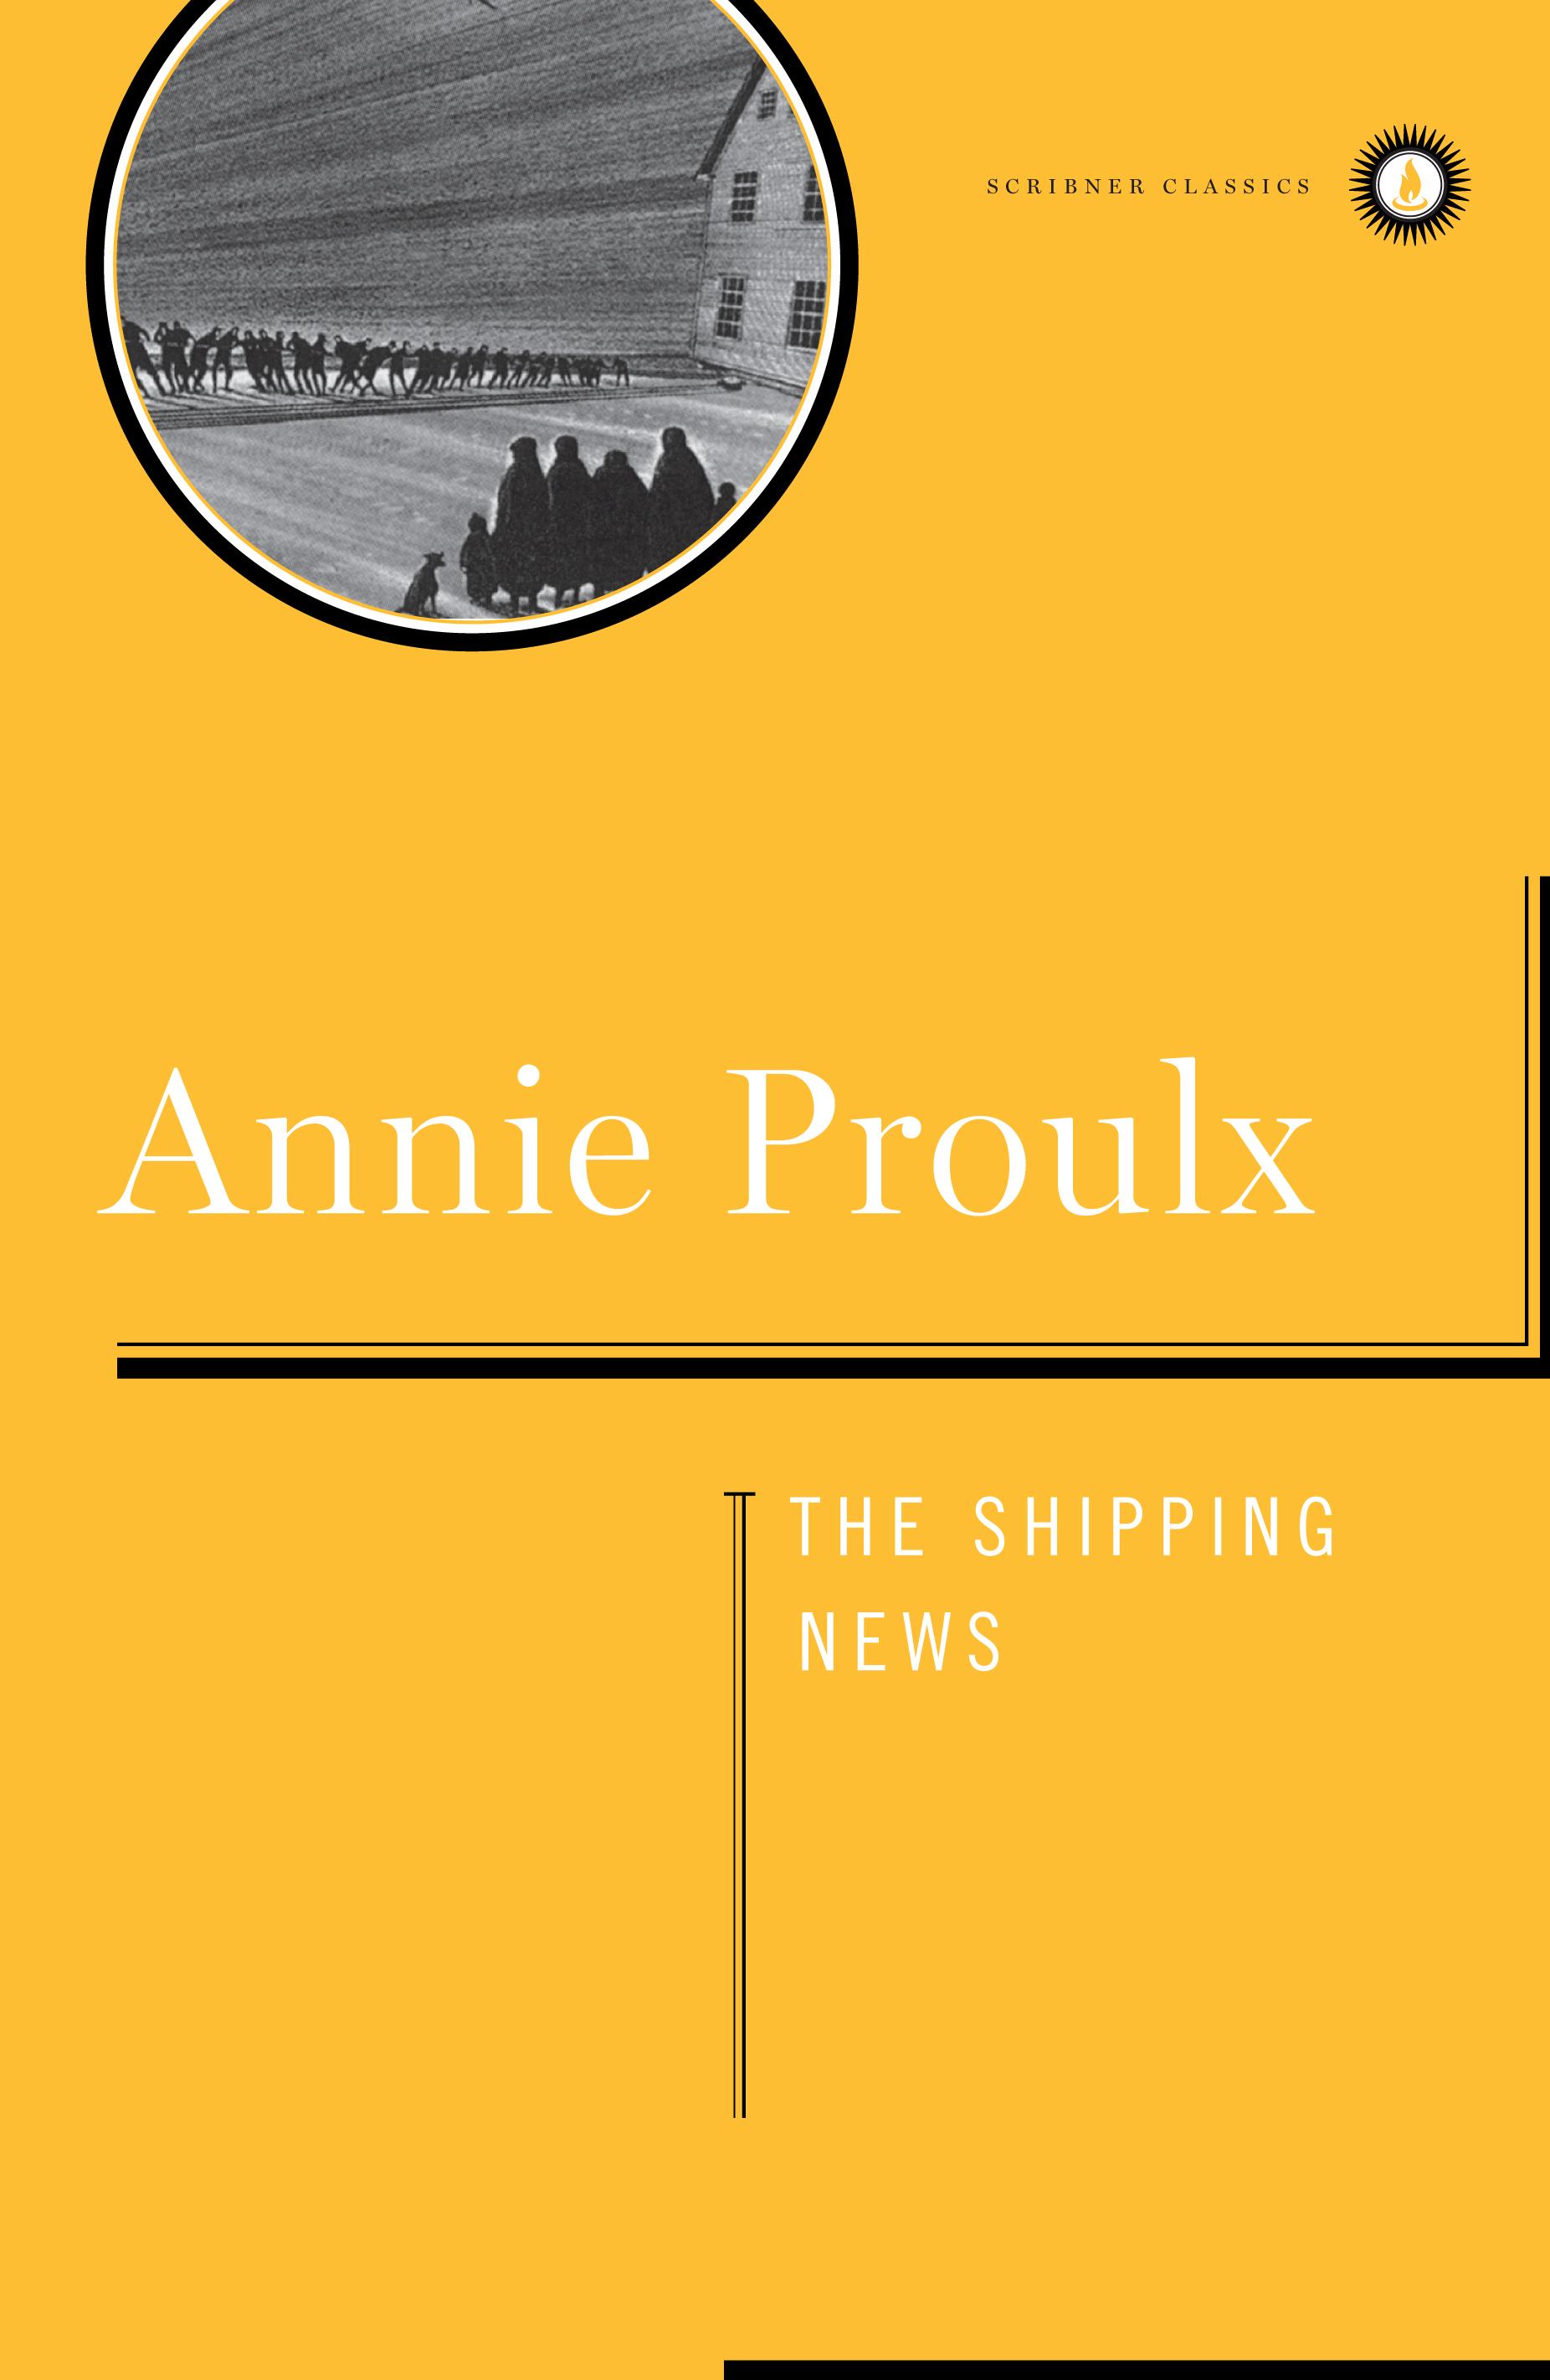 The shipping news movie plot